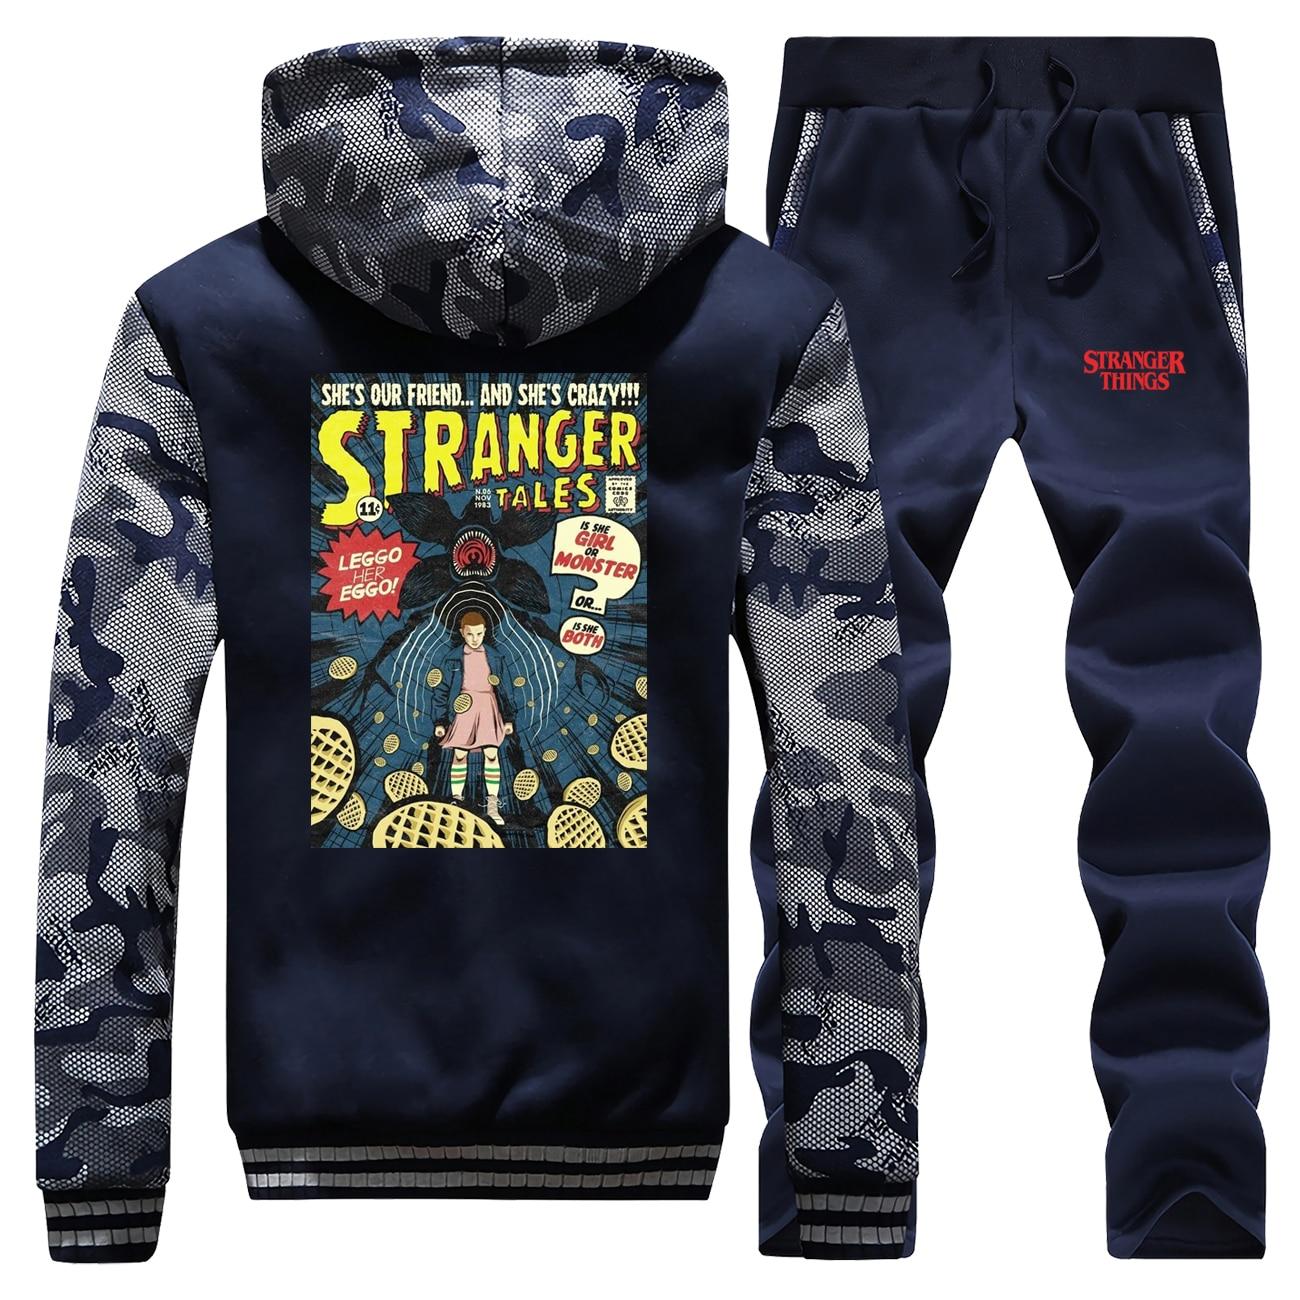 Stranger Things Tracksuits Jacket Pant Men Sportsuits Terror TV Show Hoodies Sweatpant Sets Suit 2 PCS Militray Coat Sportswear